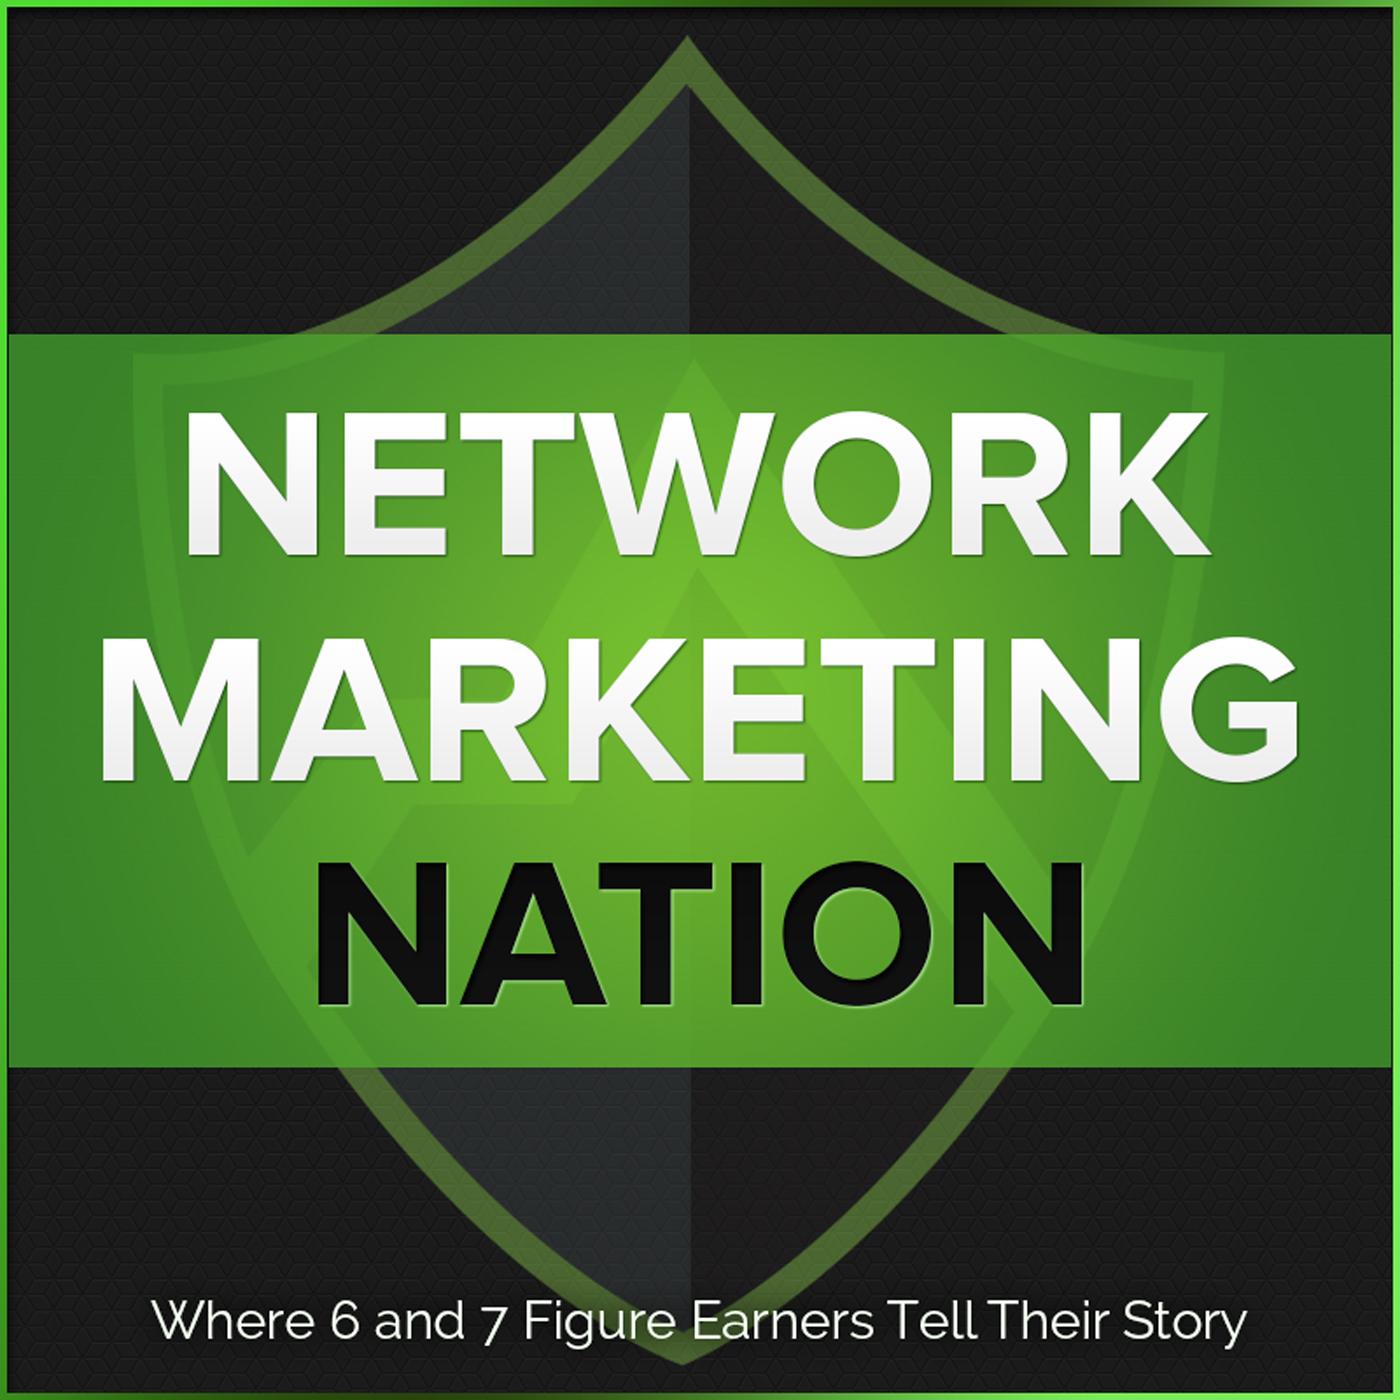 Network Marketing Nation